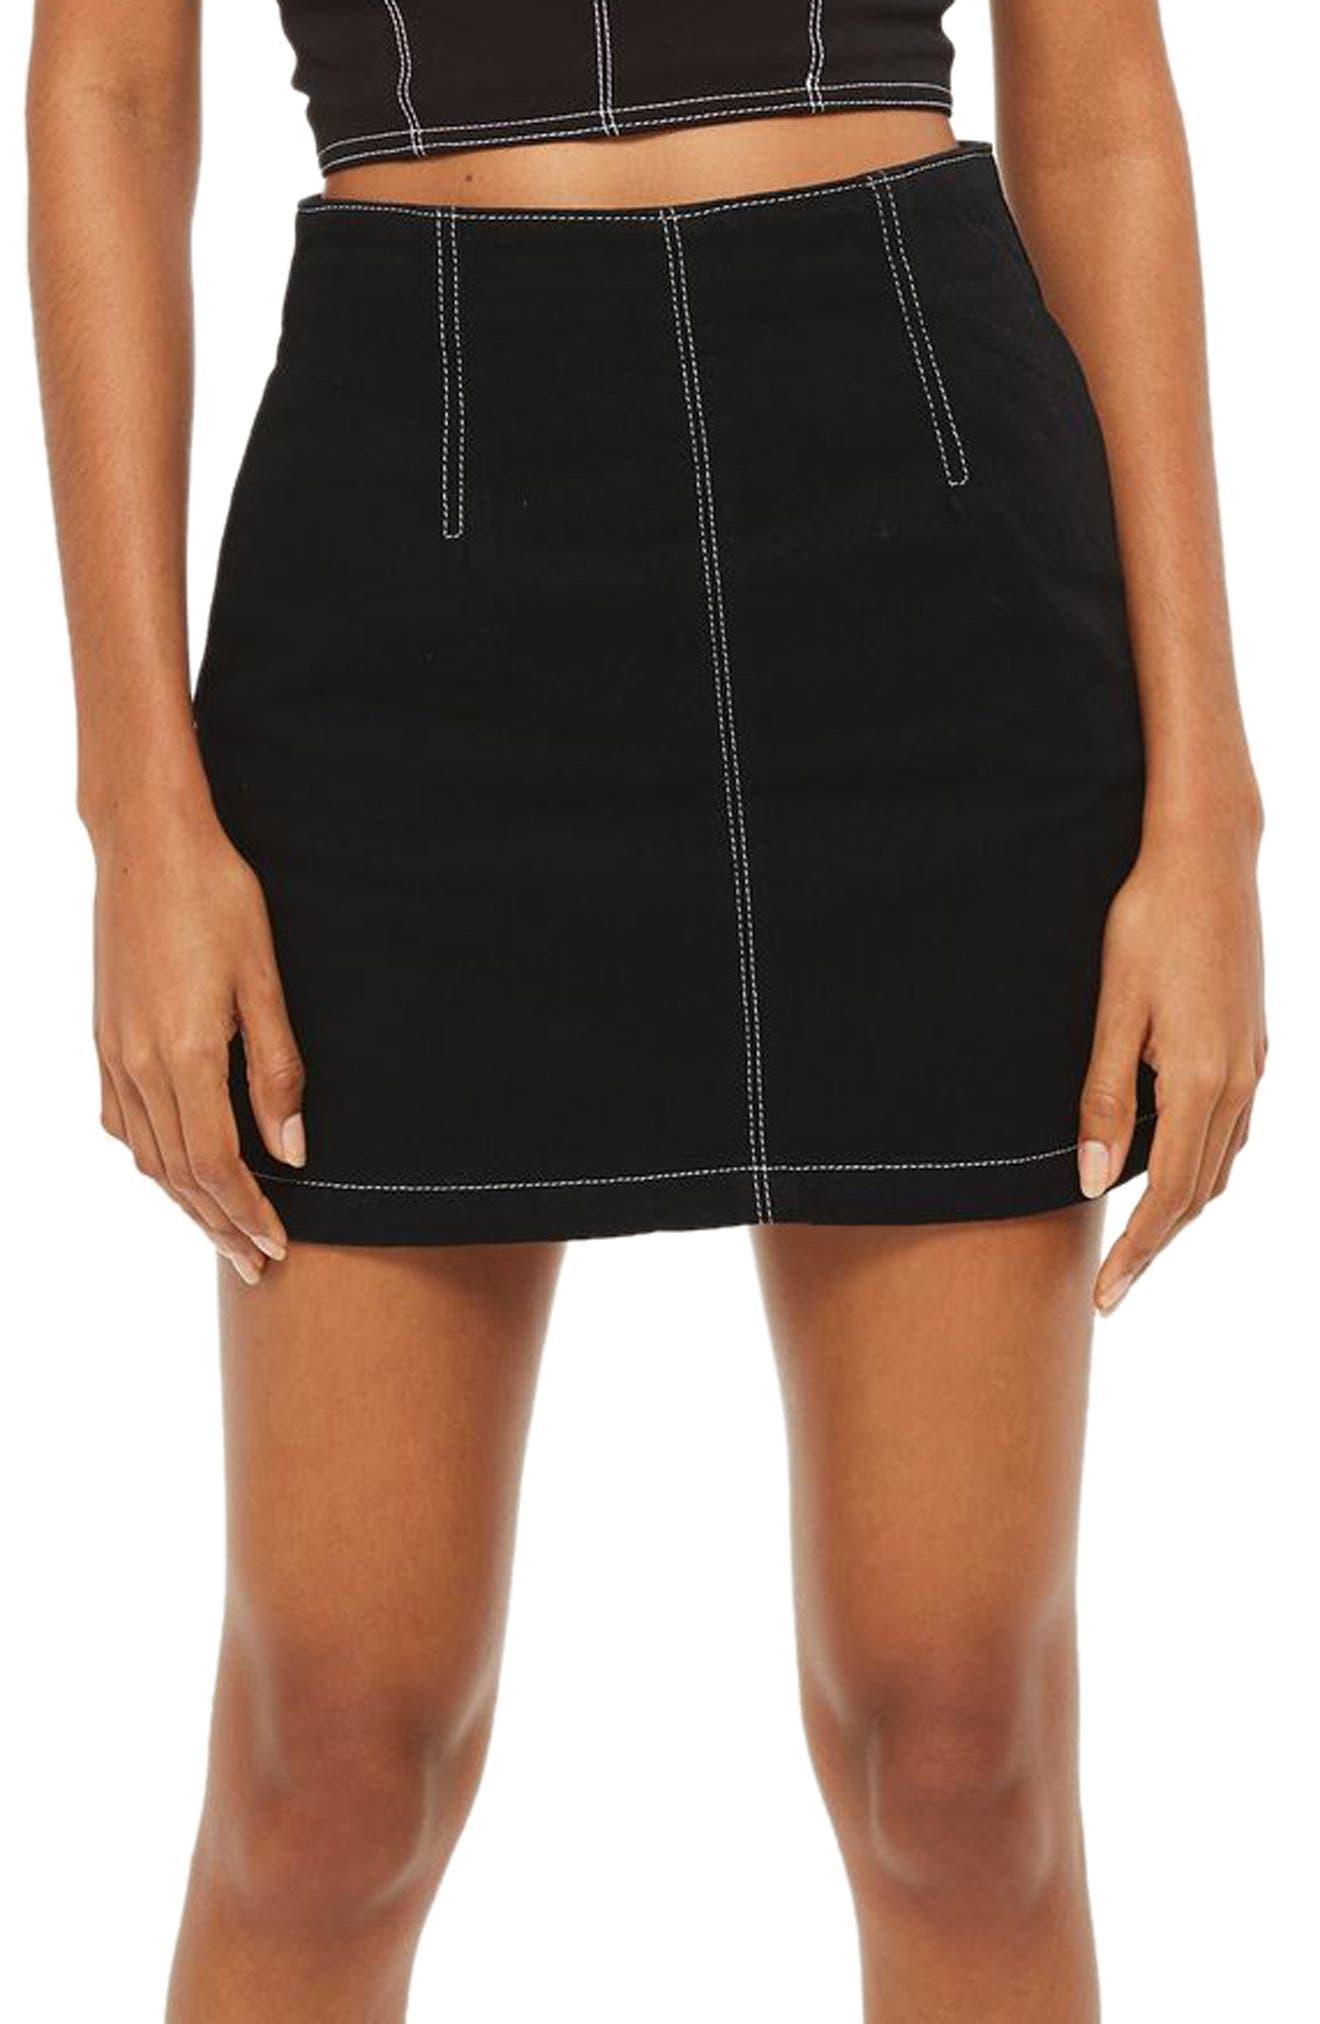 Alternate Image 1 Selected - Topshop Contrast Stitch Denim Skirt